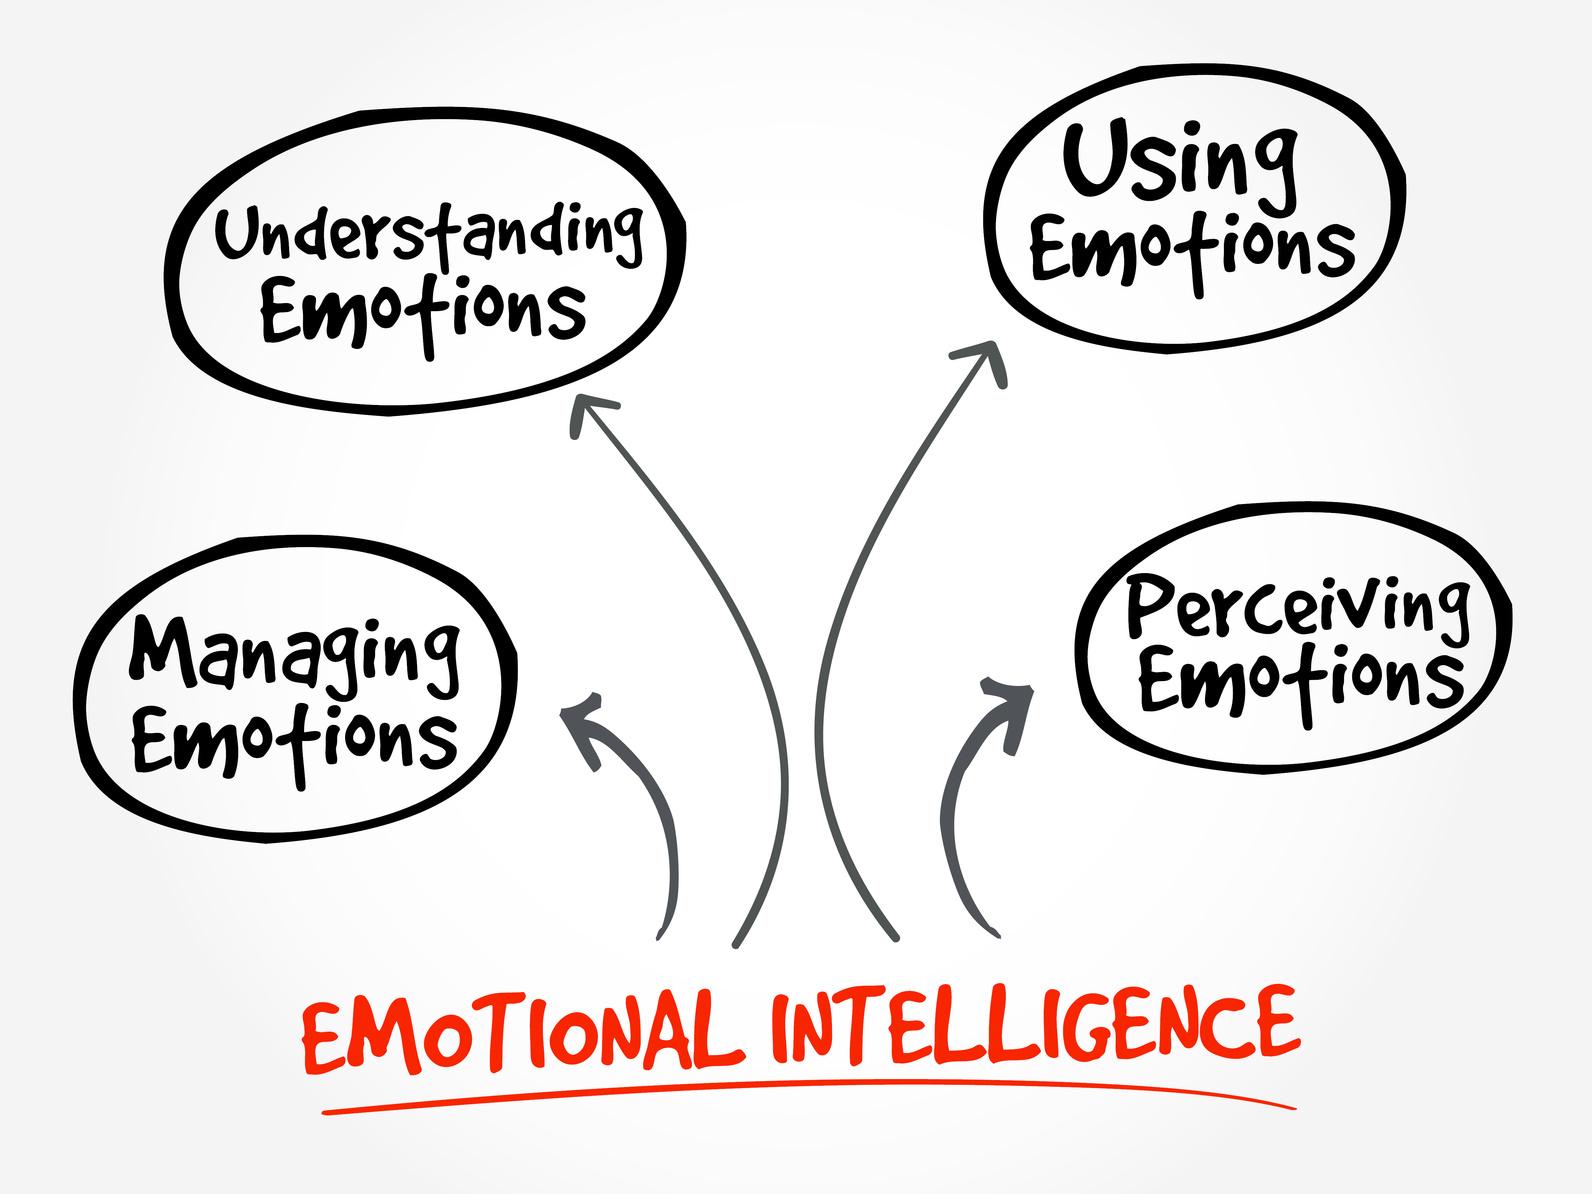 Emotional Intelligence mind map business management